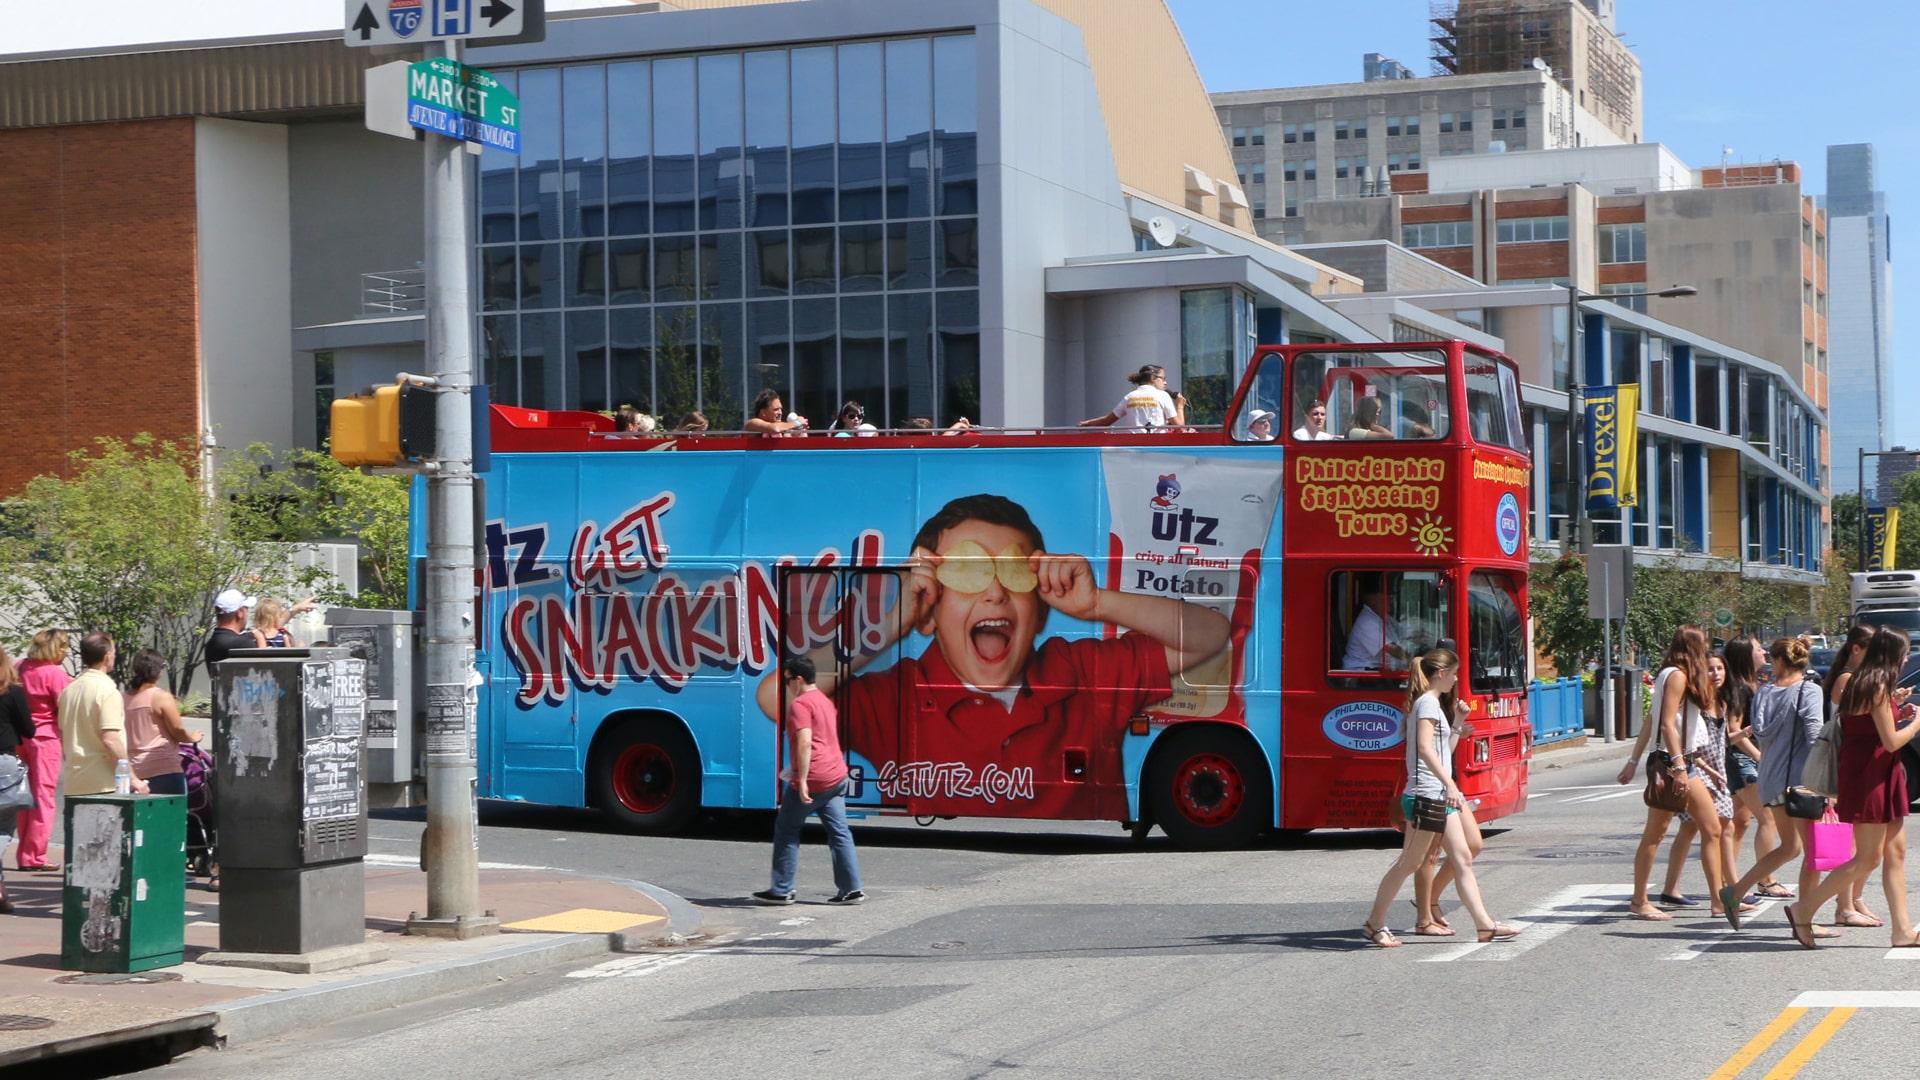 Utz bus